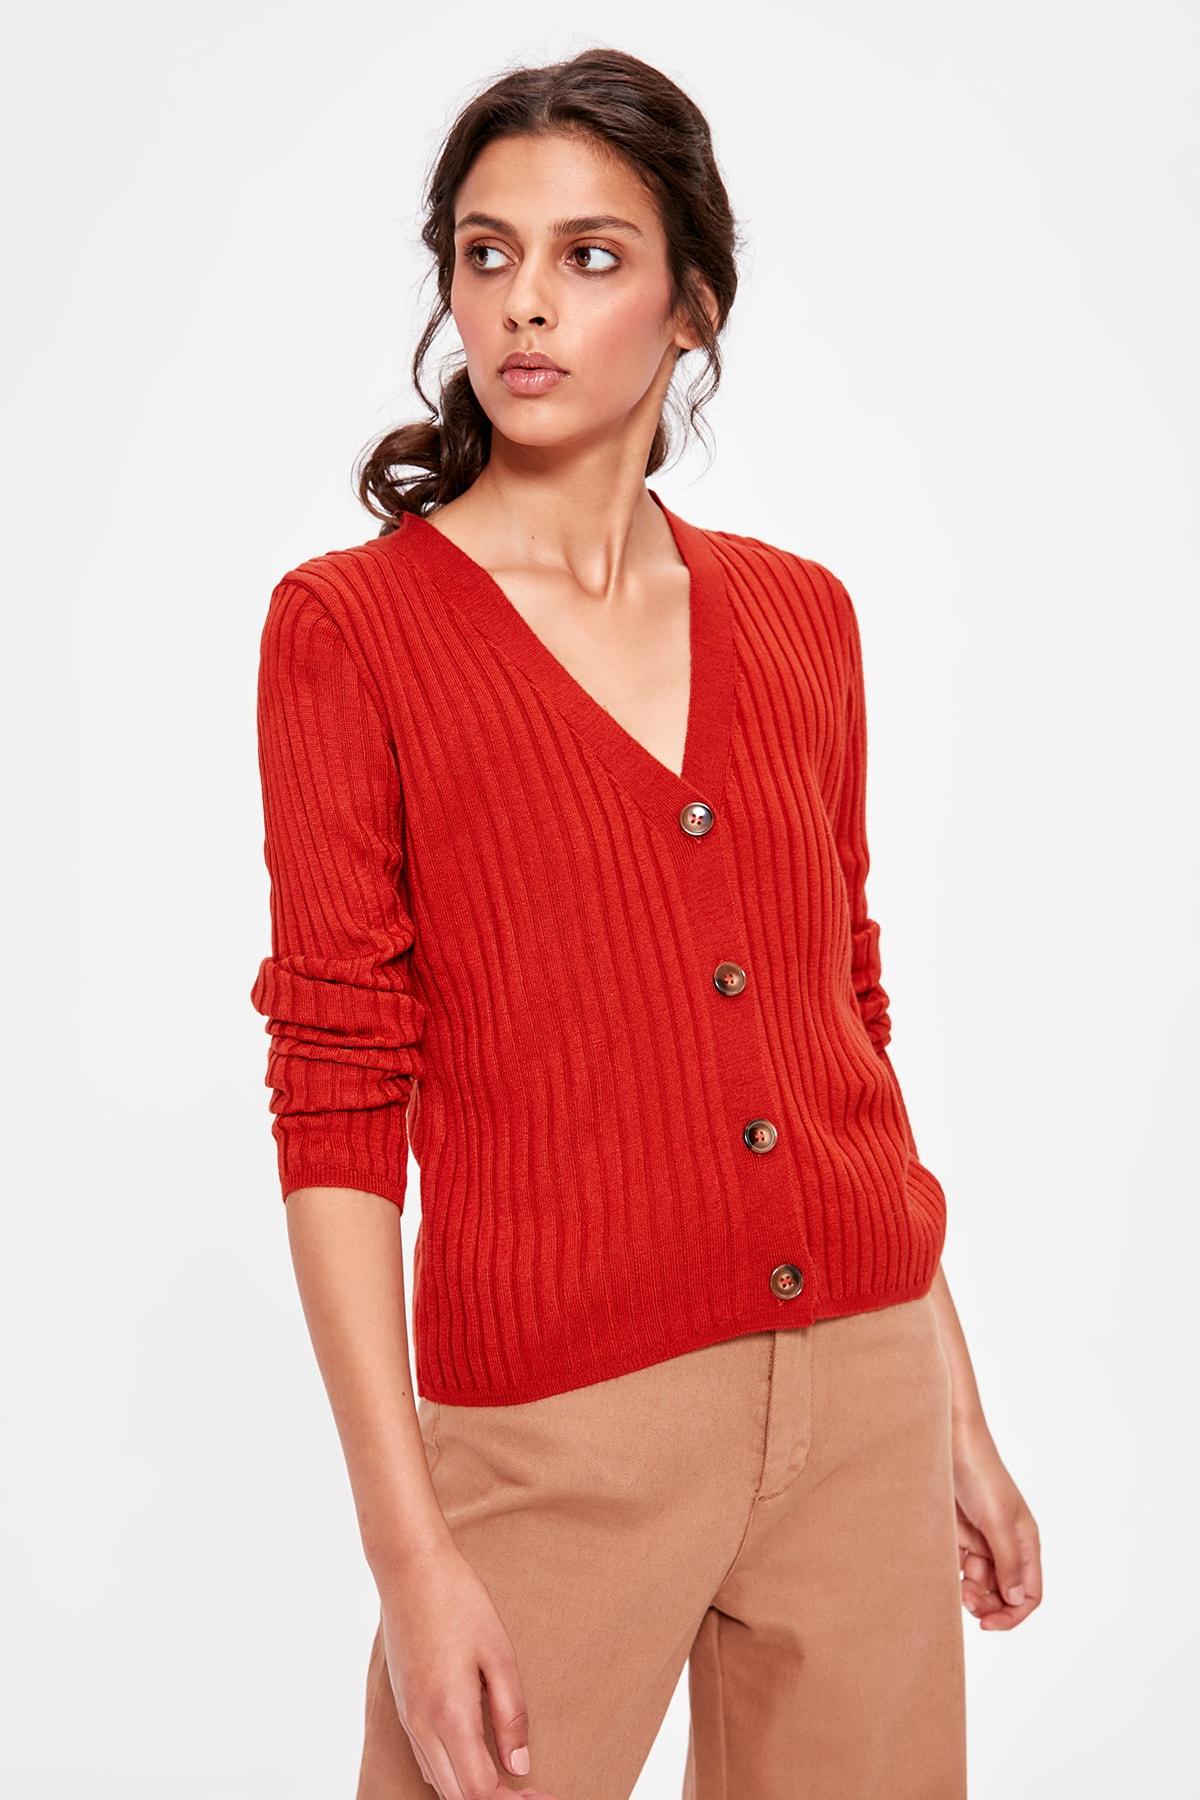 Trendyol Tile Sweater Cardigan TWOAW20HI0058